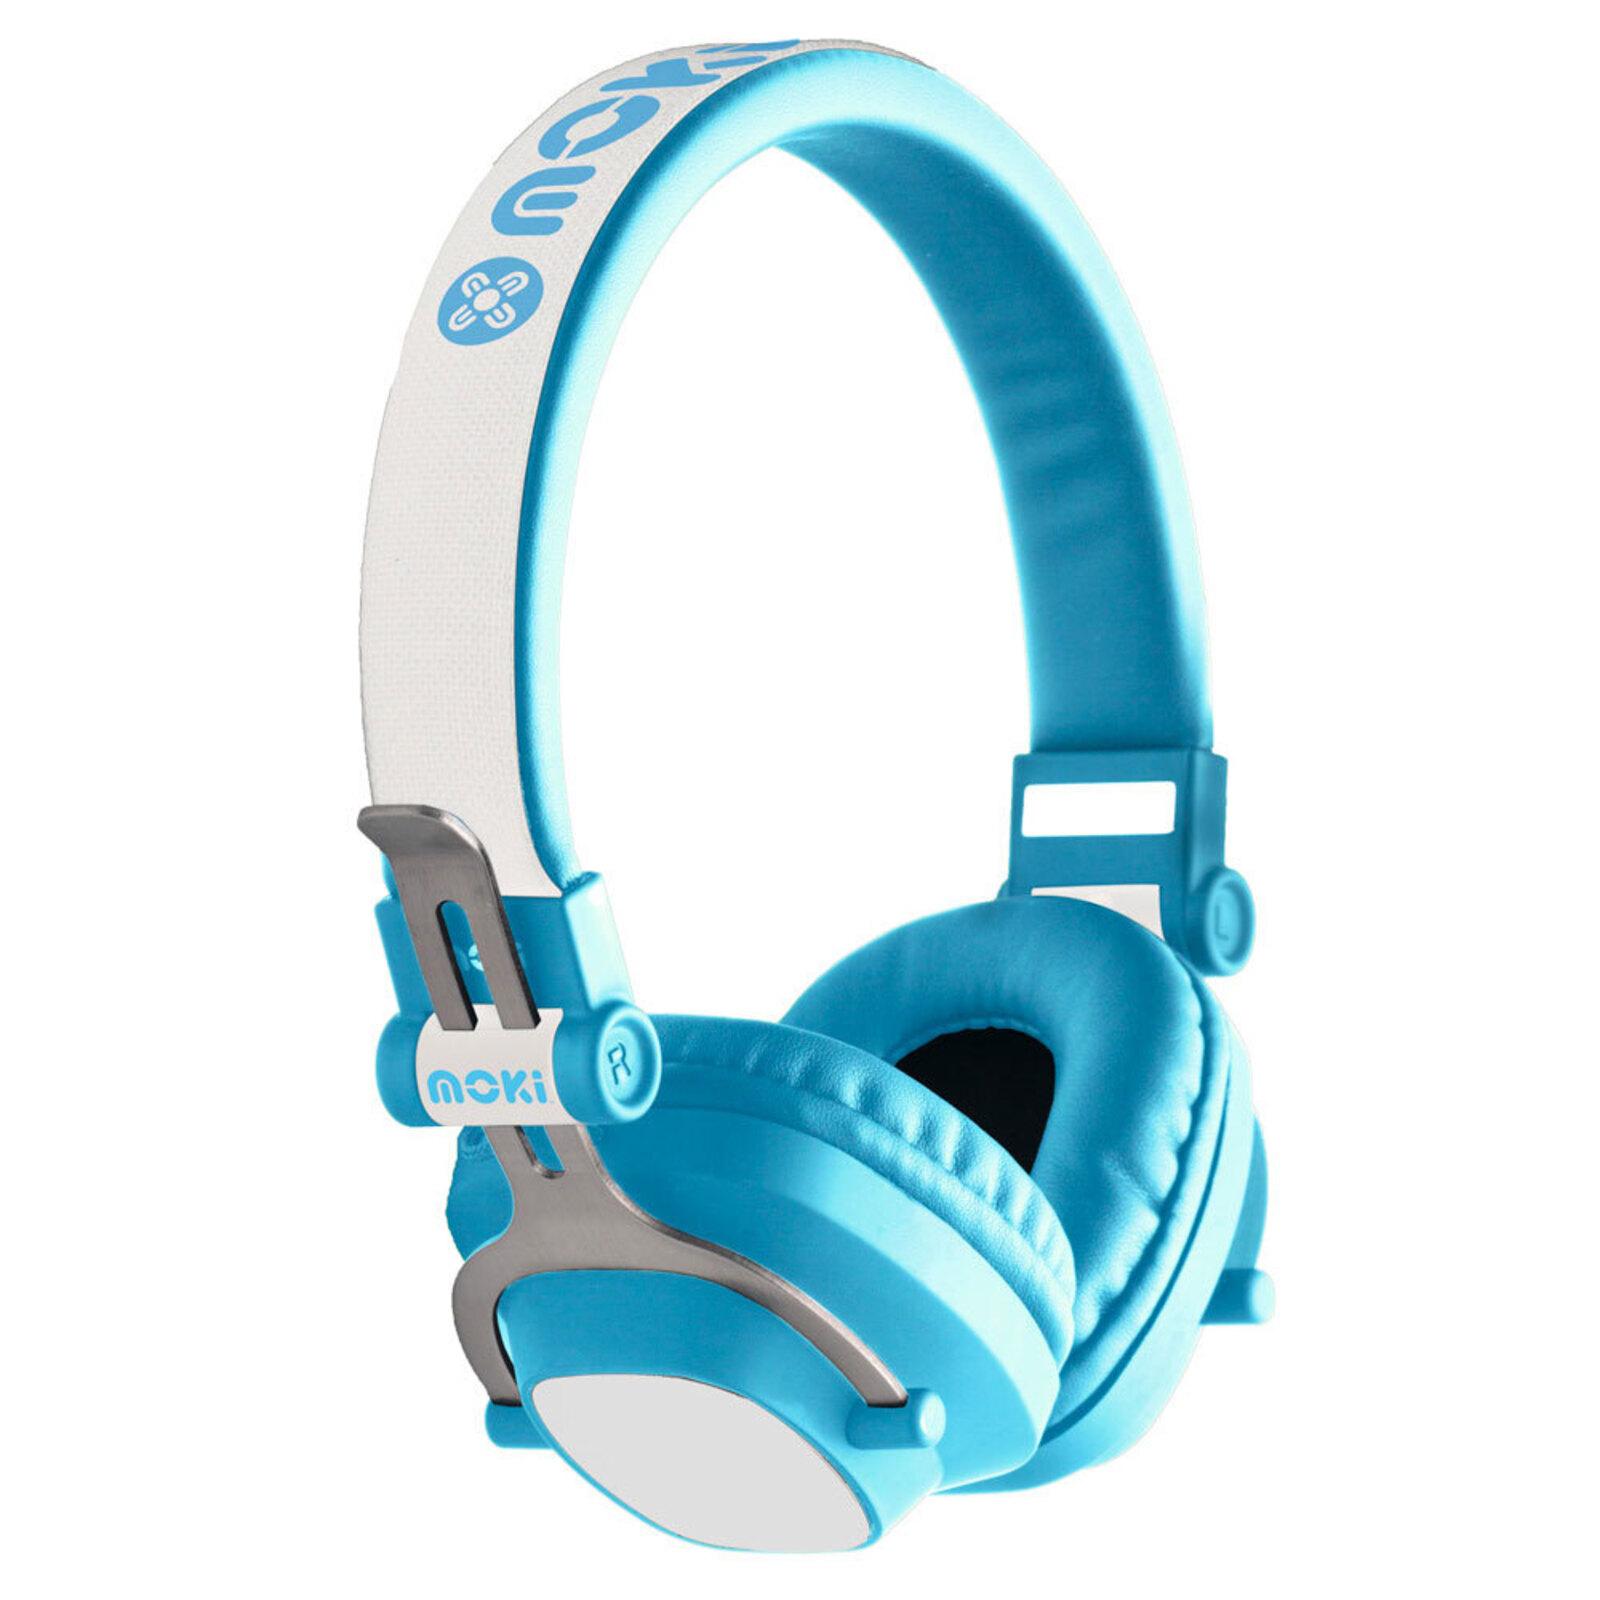 Moki Exo Kids Wireless Bluetooth Headphones On/Over Ear Cup Headband w/ Mic Blue